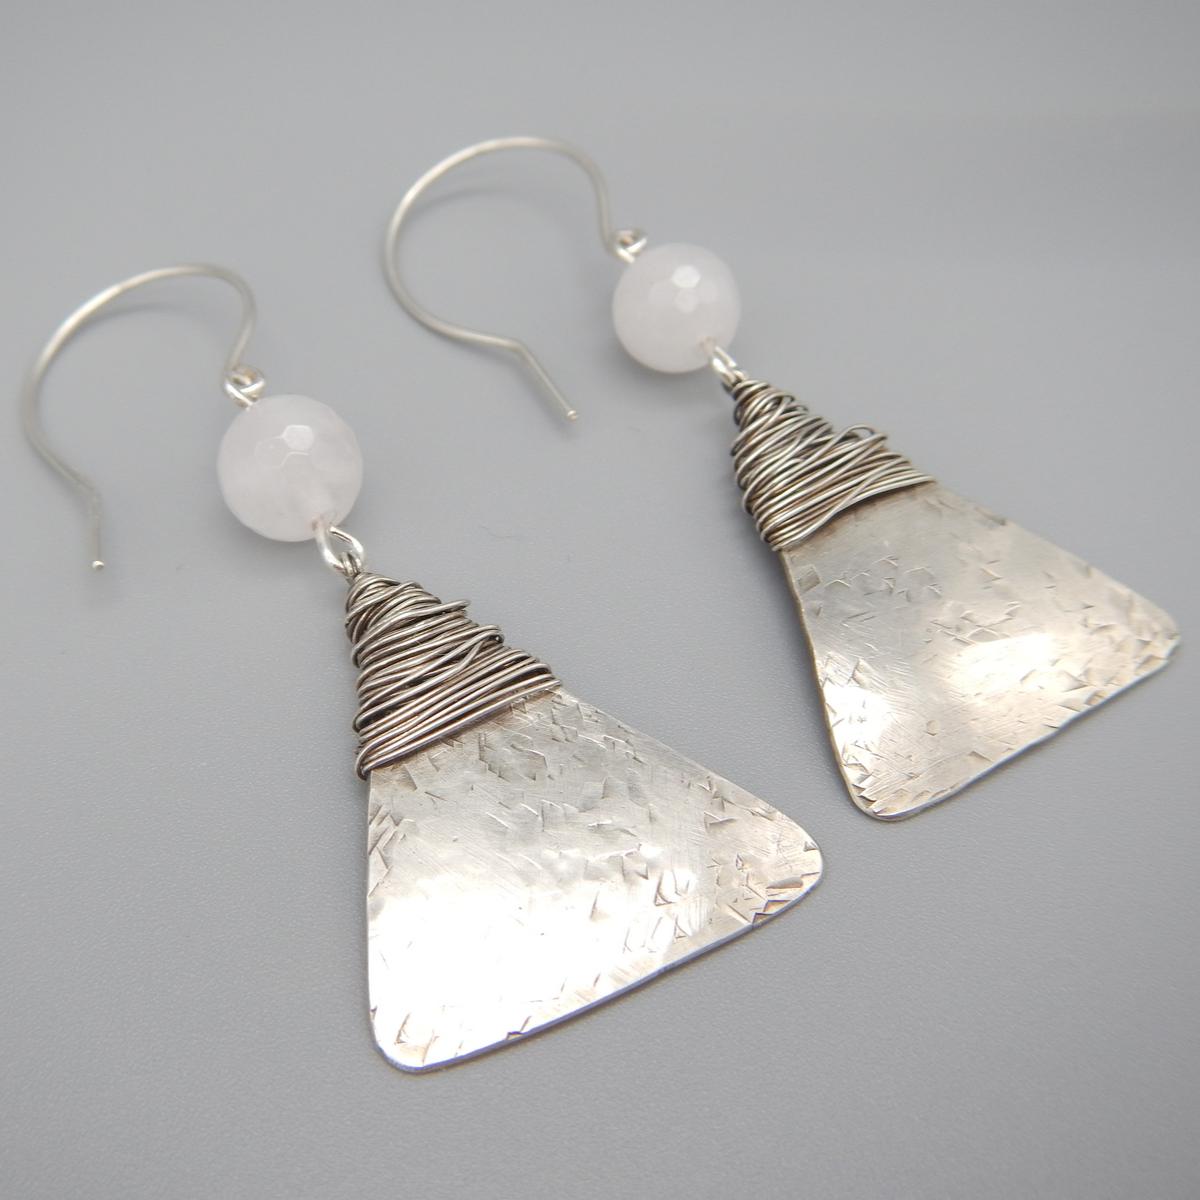 Rose Quartz Dangle Earrings, Sterling Silver Dangles, Natural Gemstones, Pink